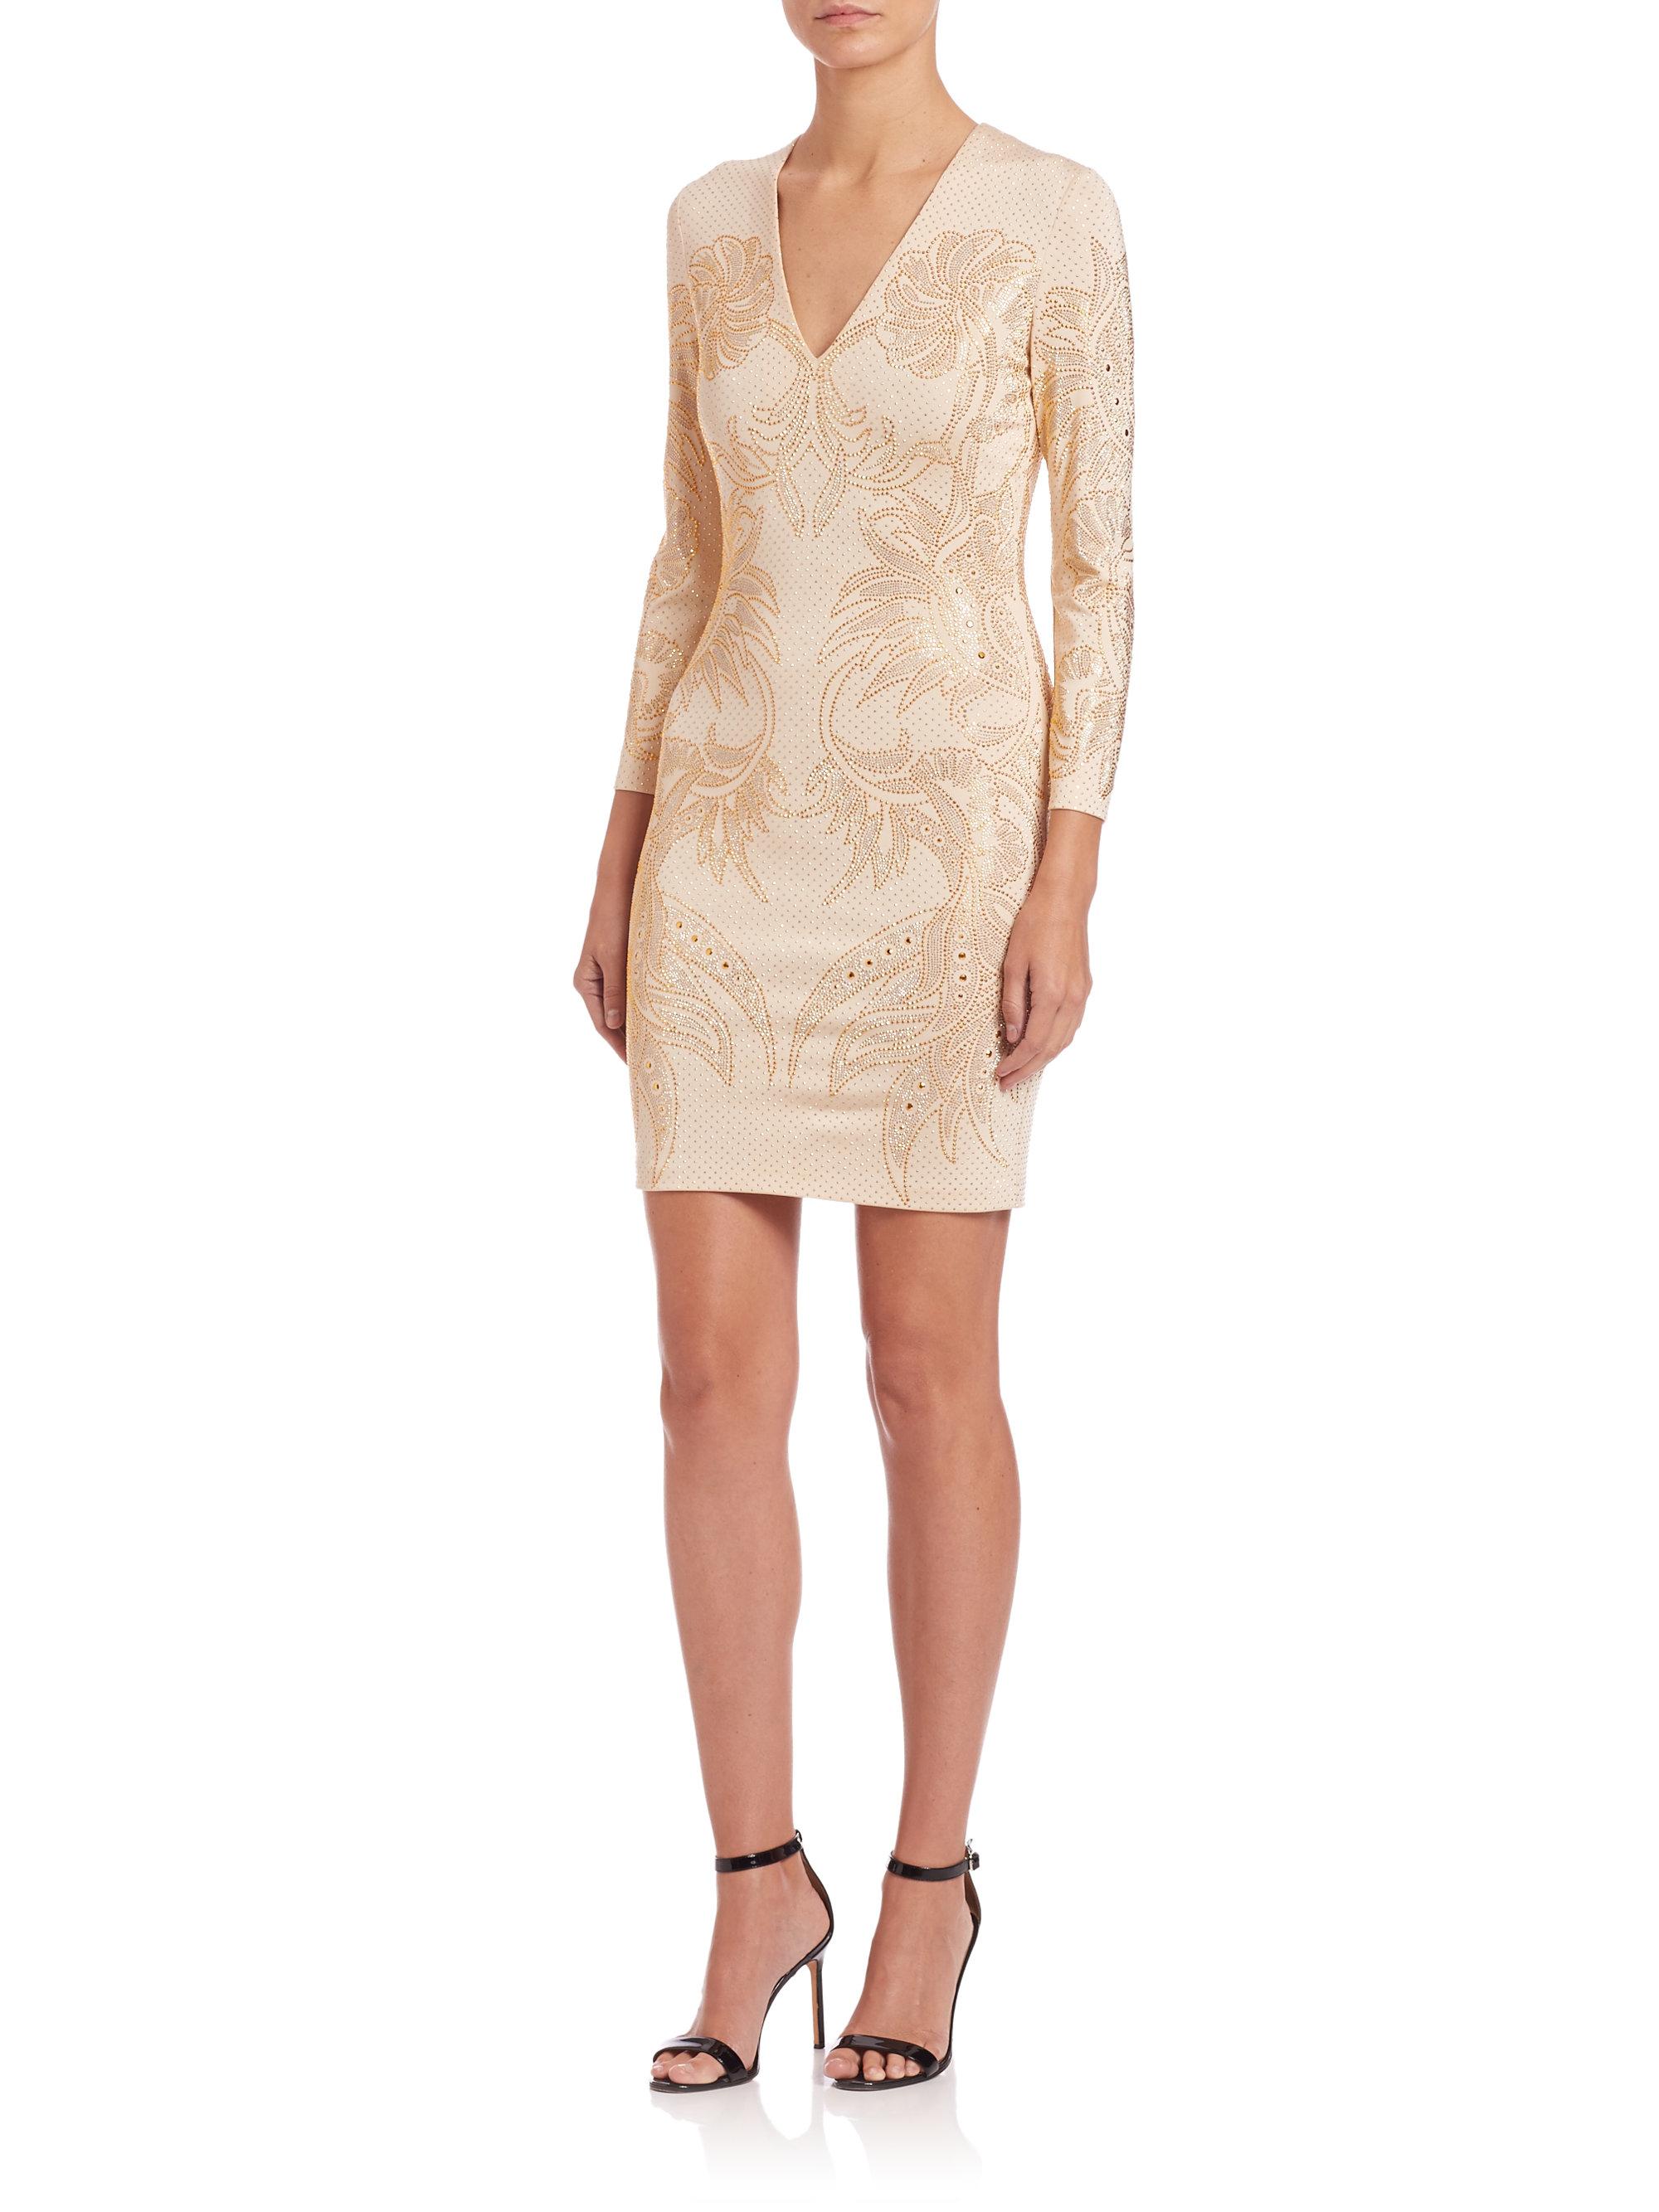 Just Cavalli Woman Asymmetric Lace-trimmed Cotton Dress Navy Size 42 Just Cavalli yMEp0iwPg7